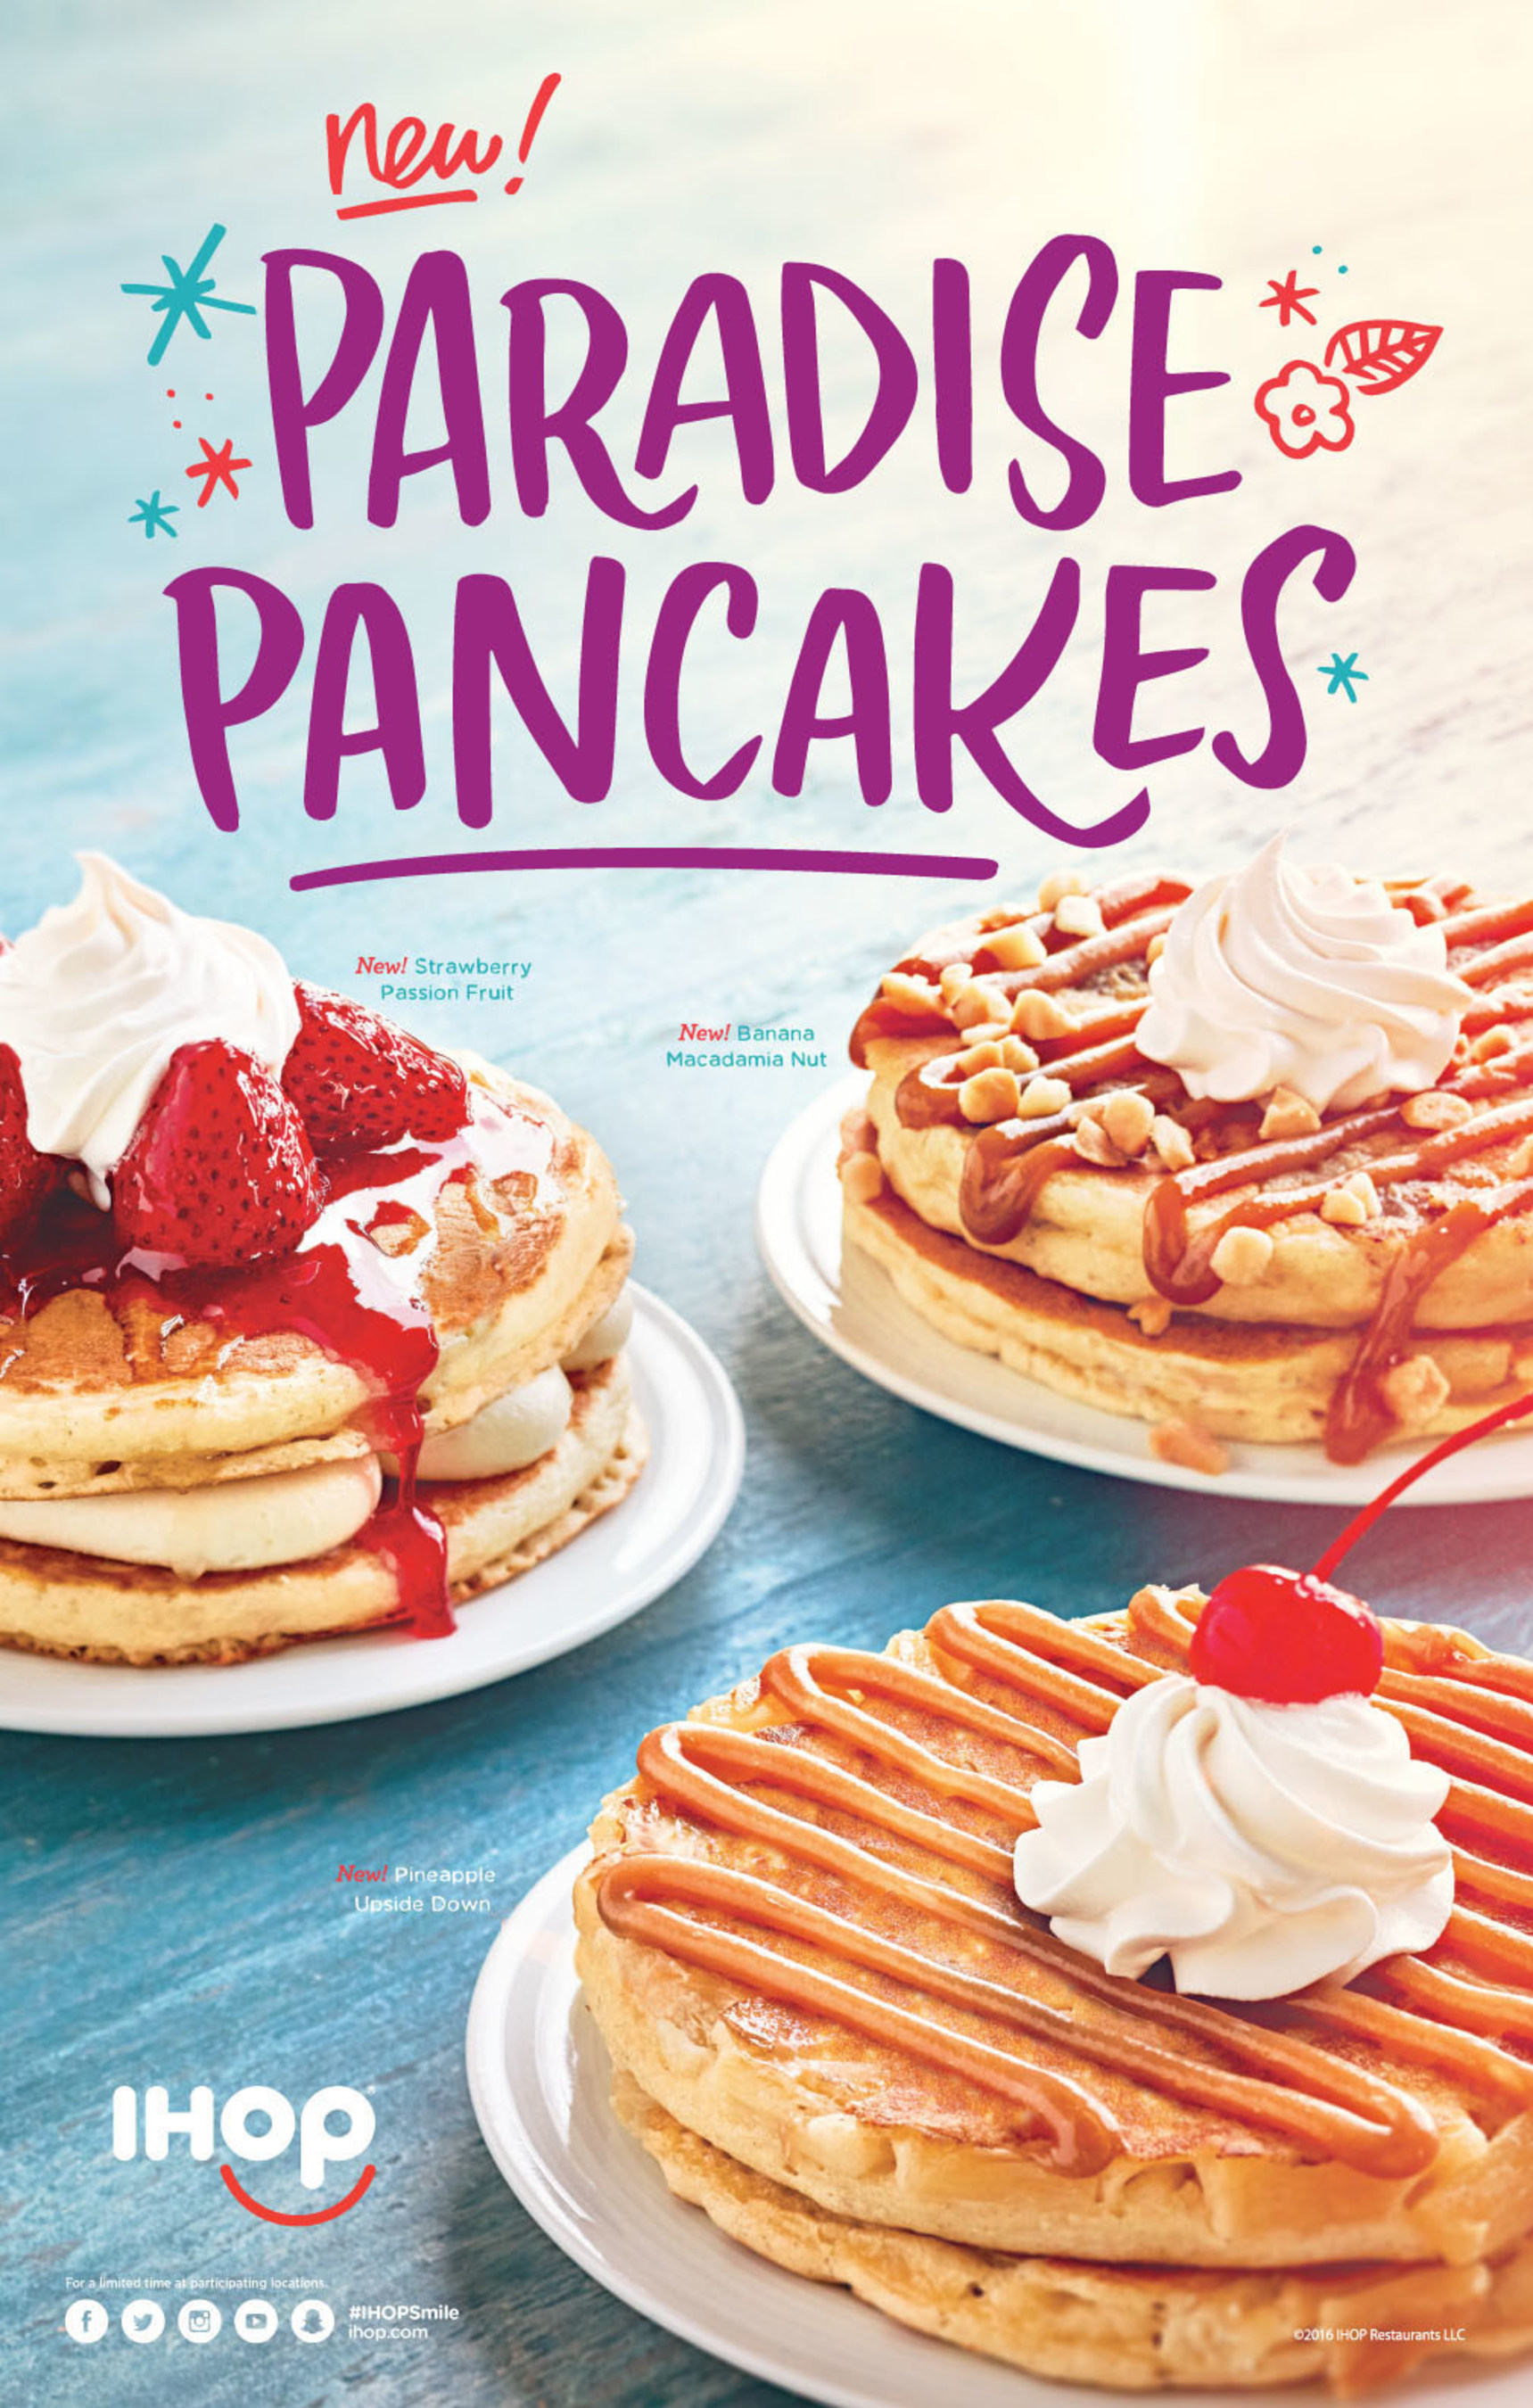 IHOP's Paradise Pancakes